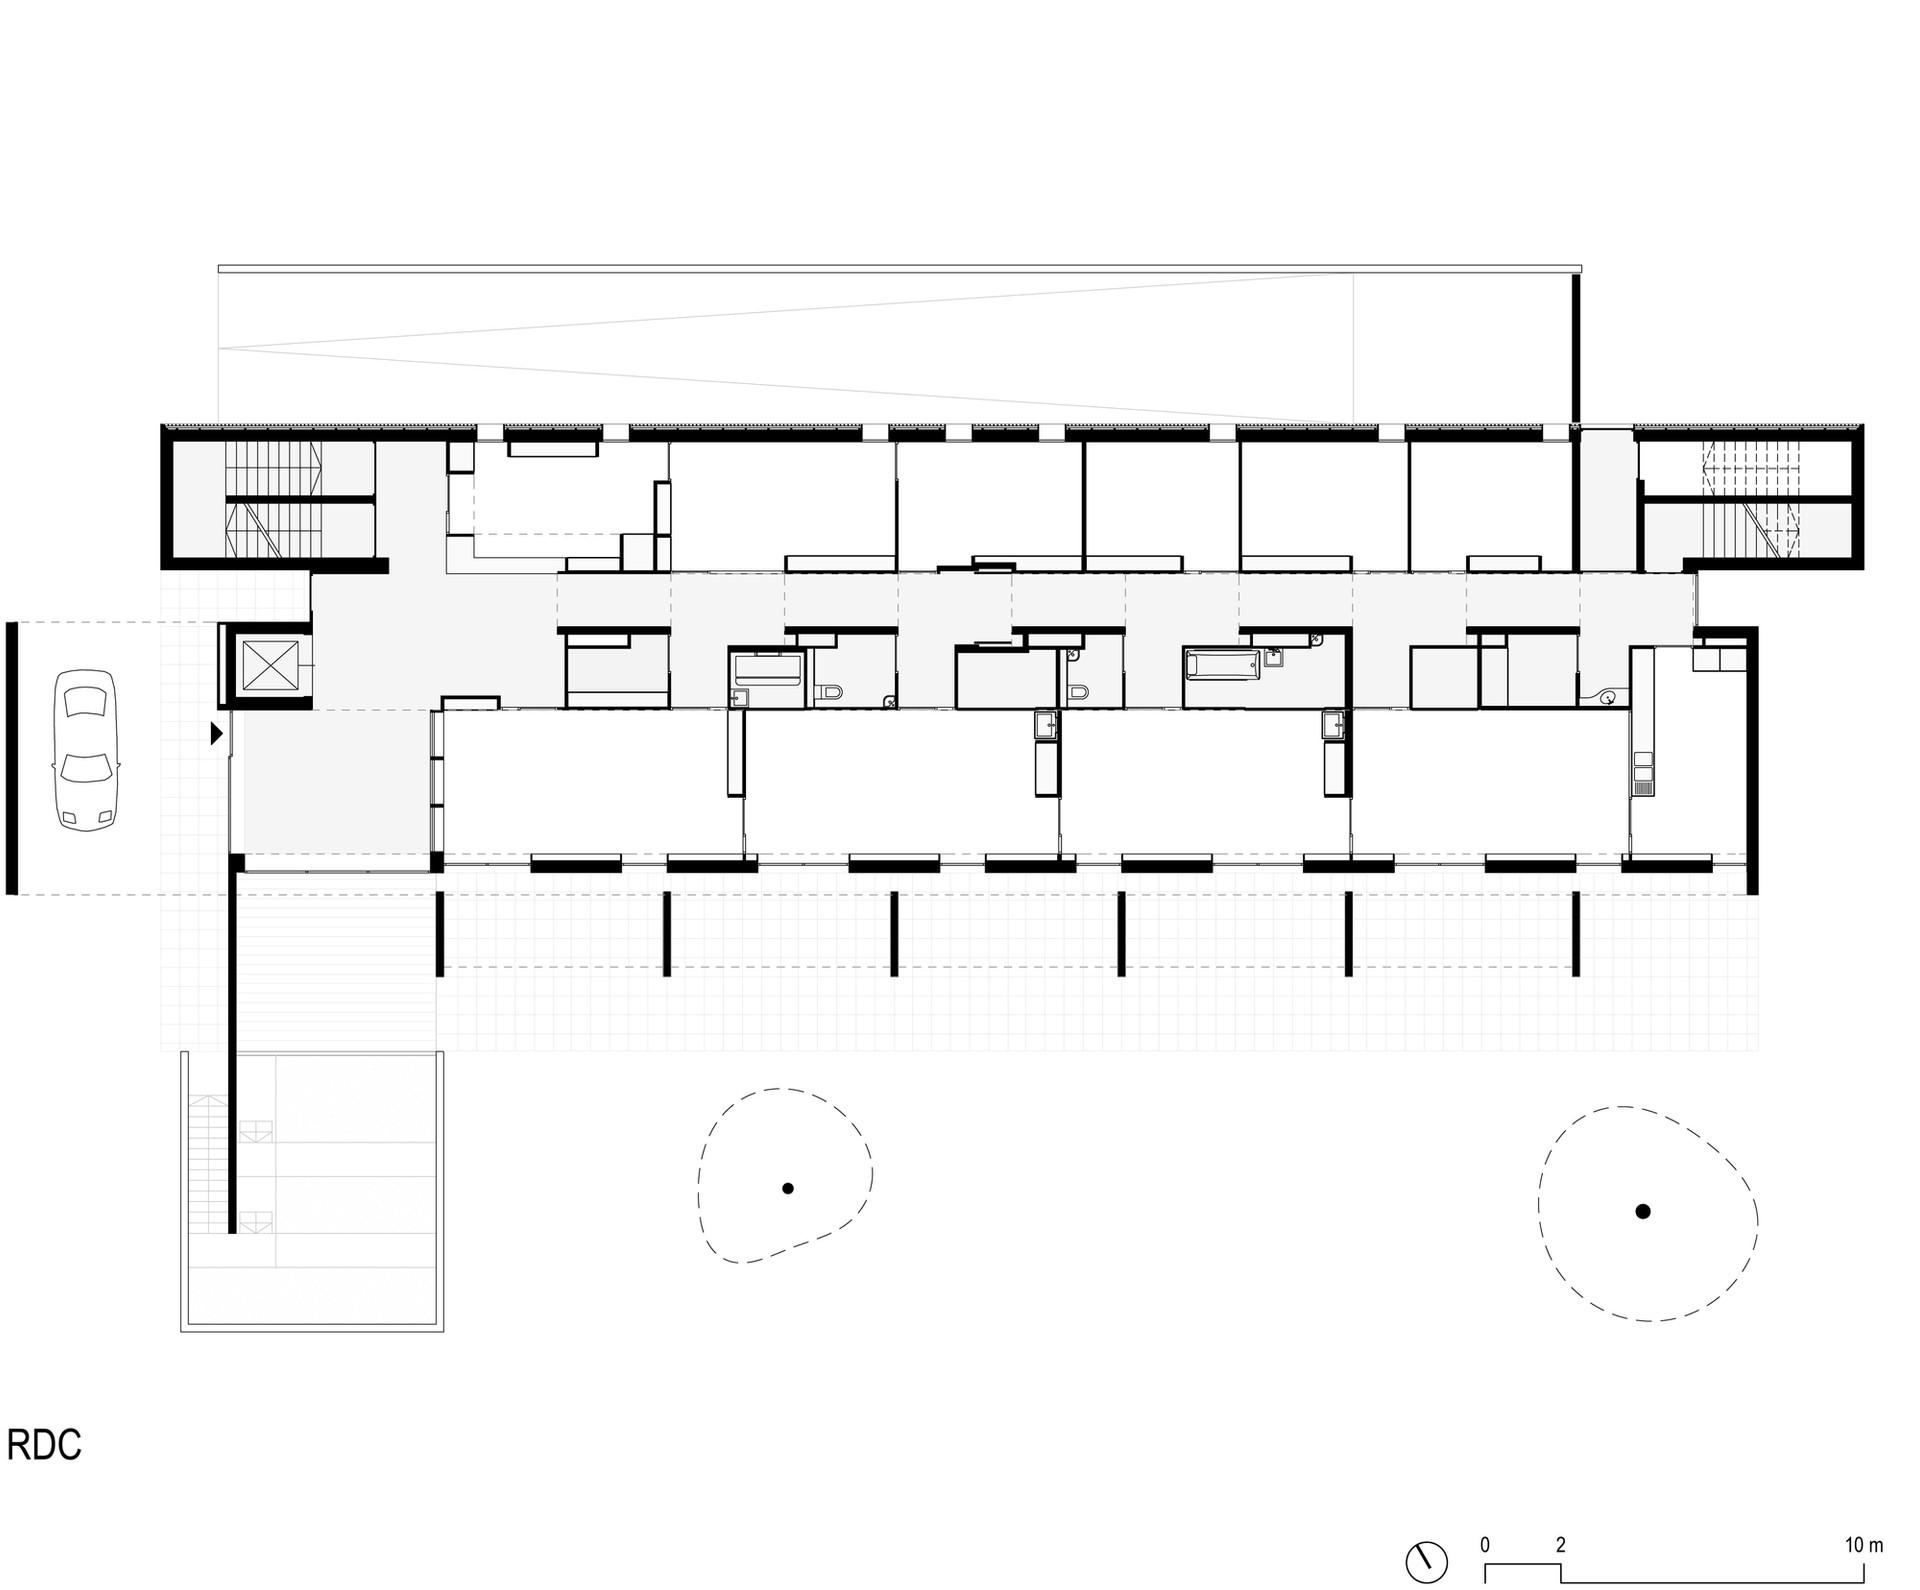 APA_C plan rdc.jpg